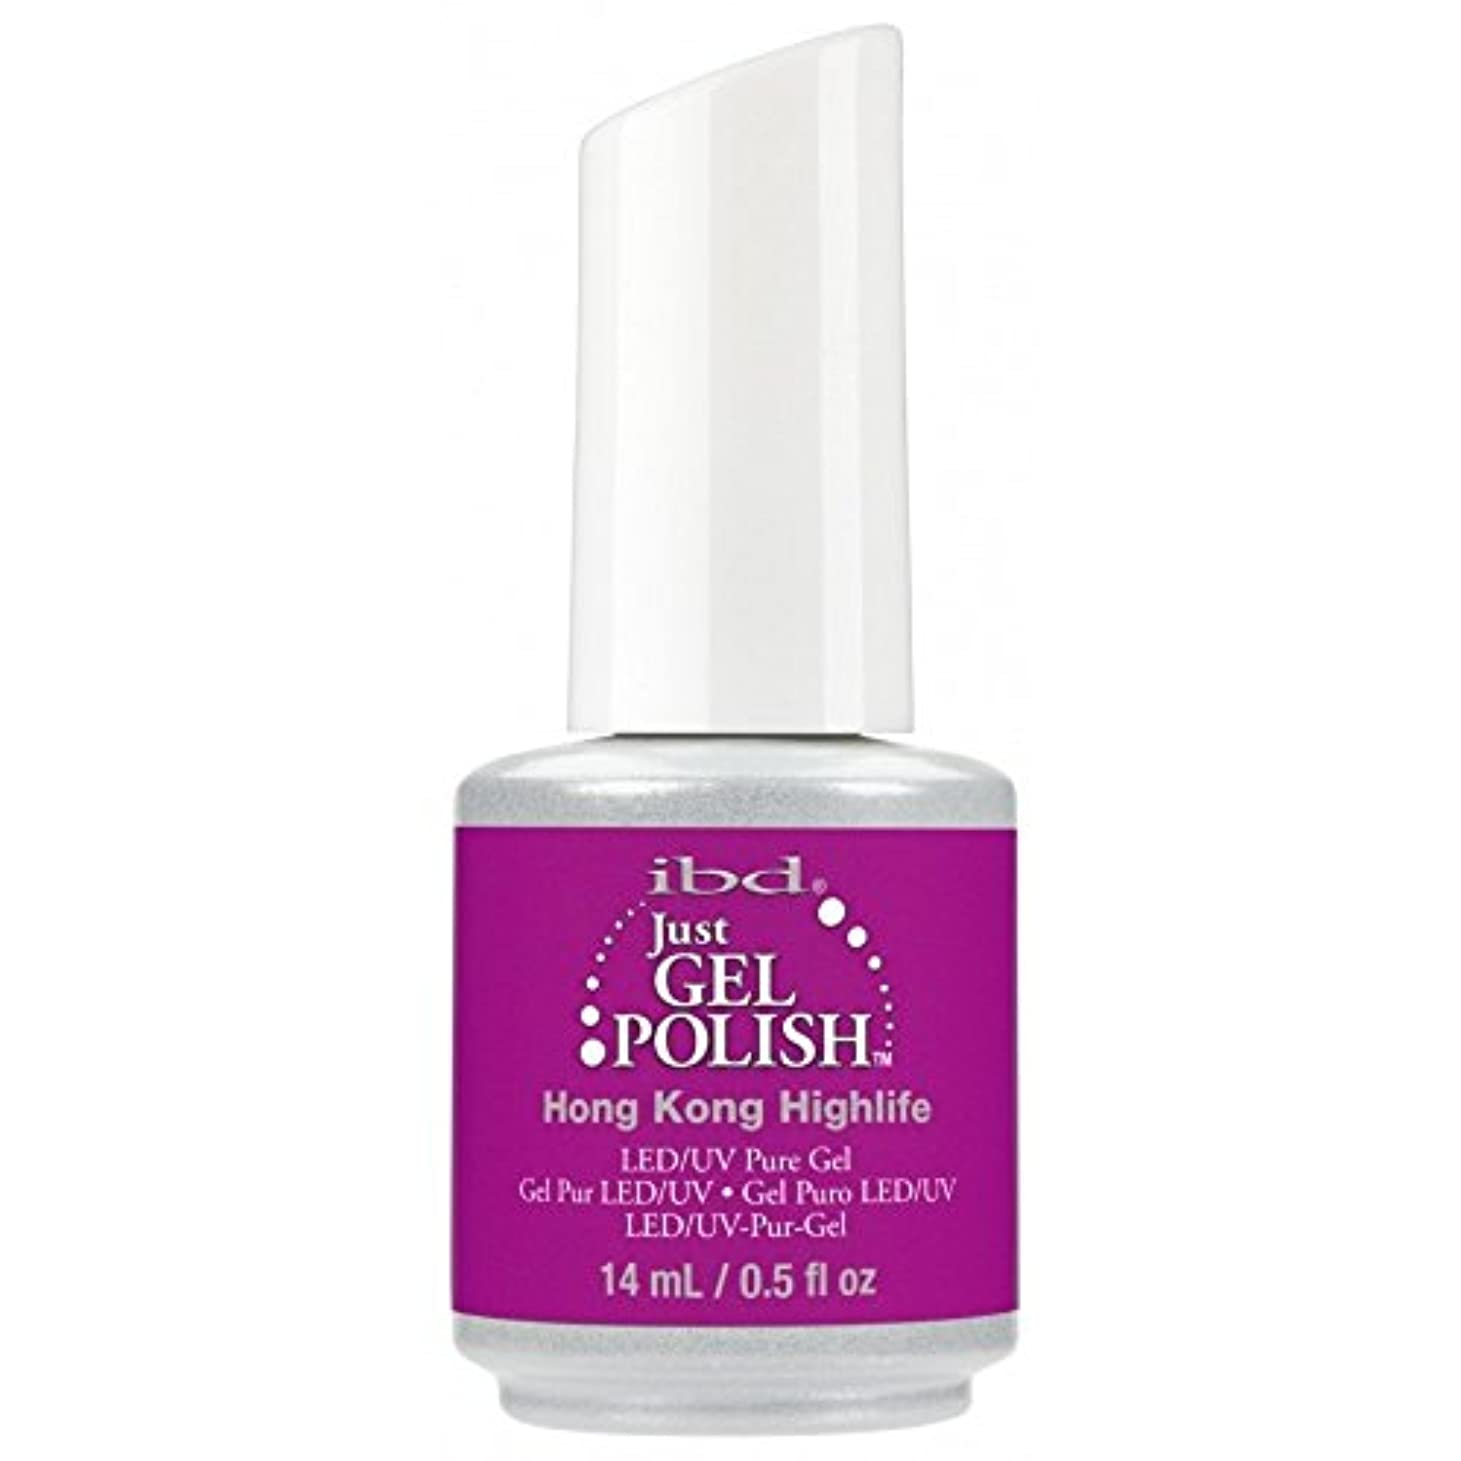 ibd Just Gel Nail Polish - Summer 2017 Destination Colour Collection - Hong Kong Highlife - 14ml / 0.5oz